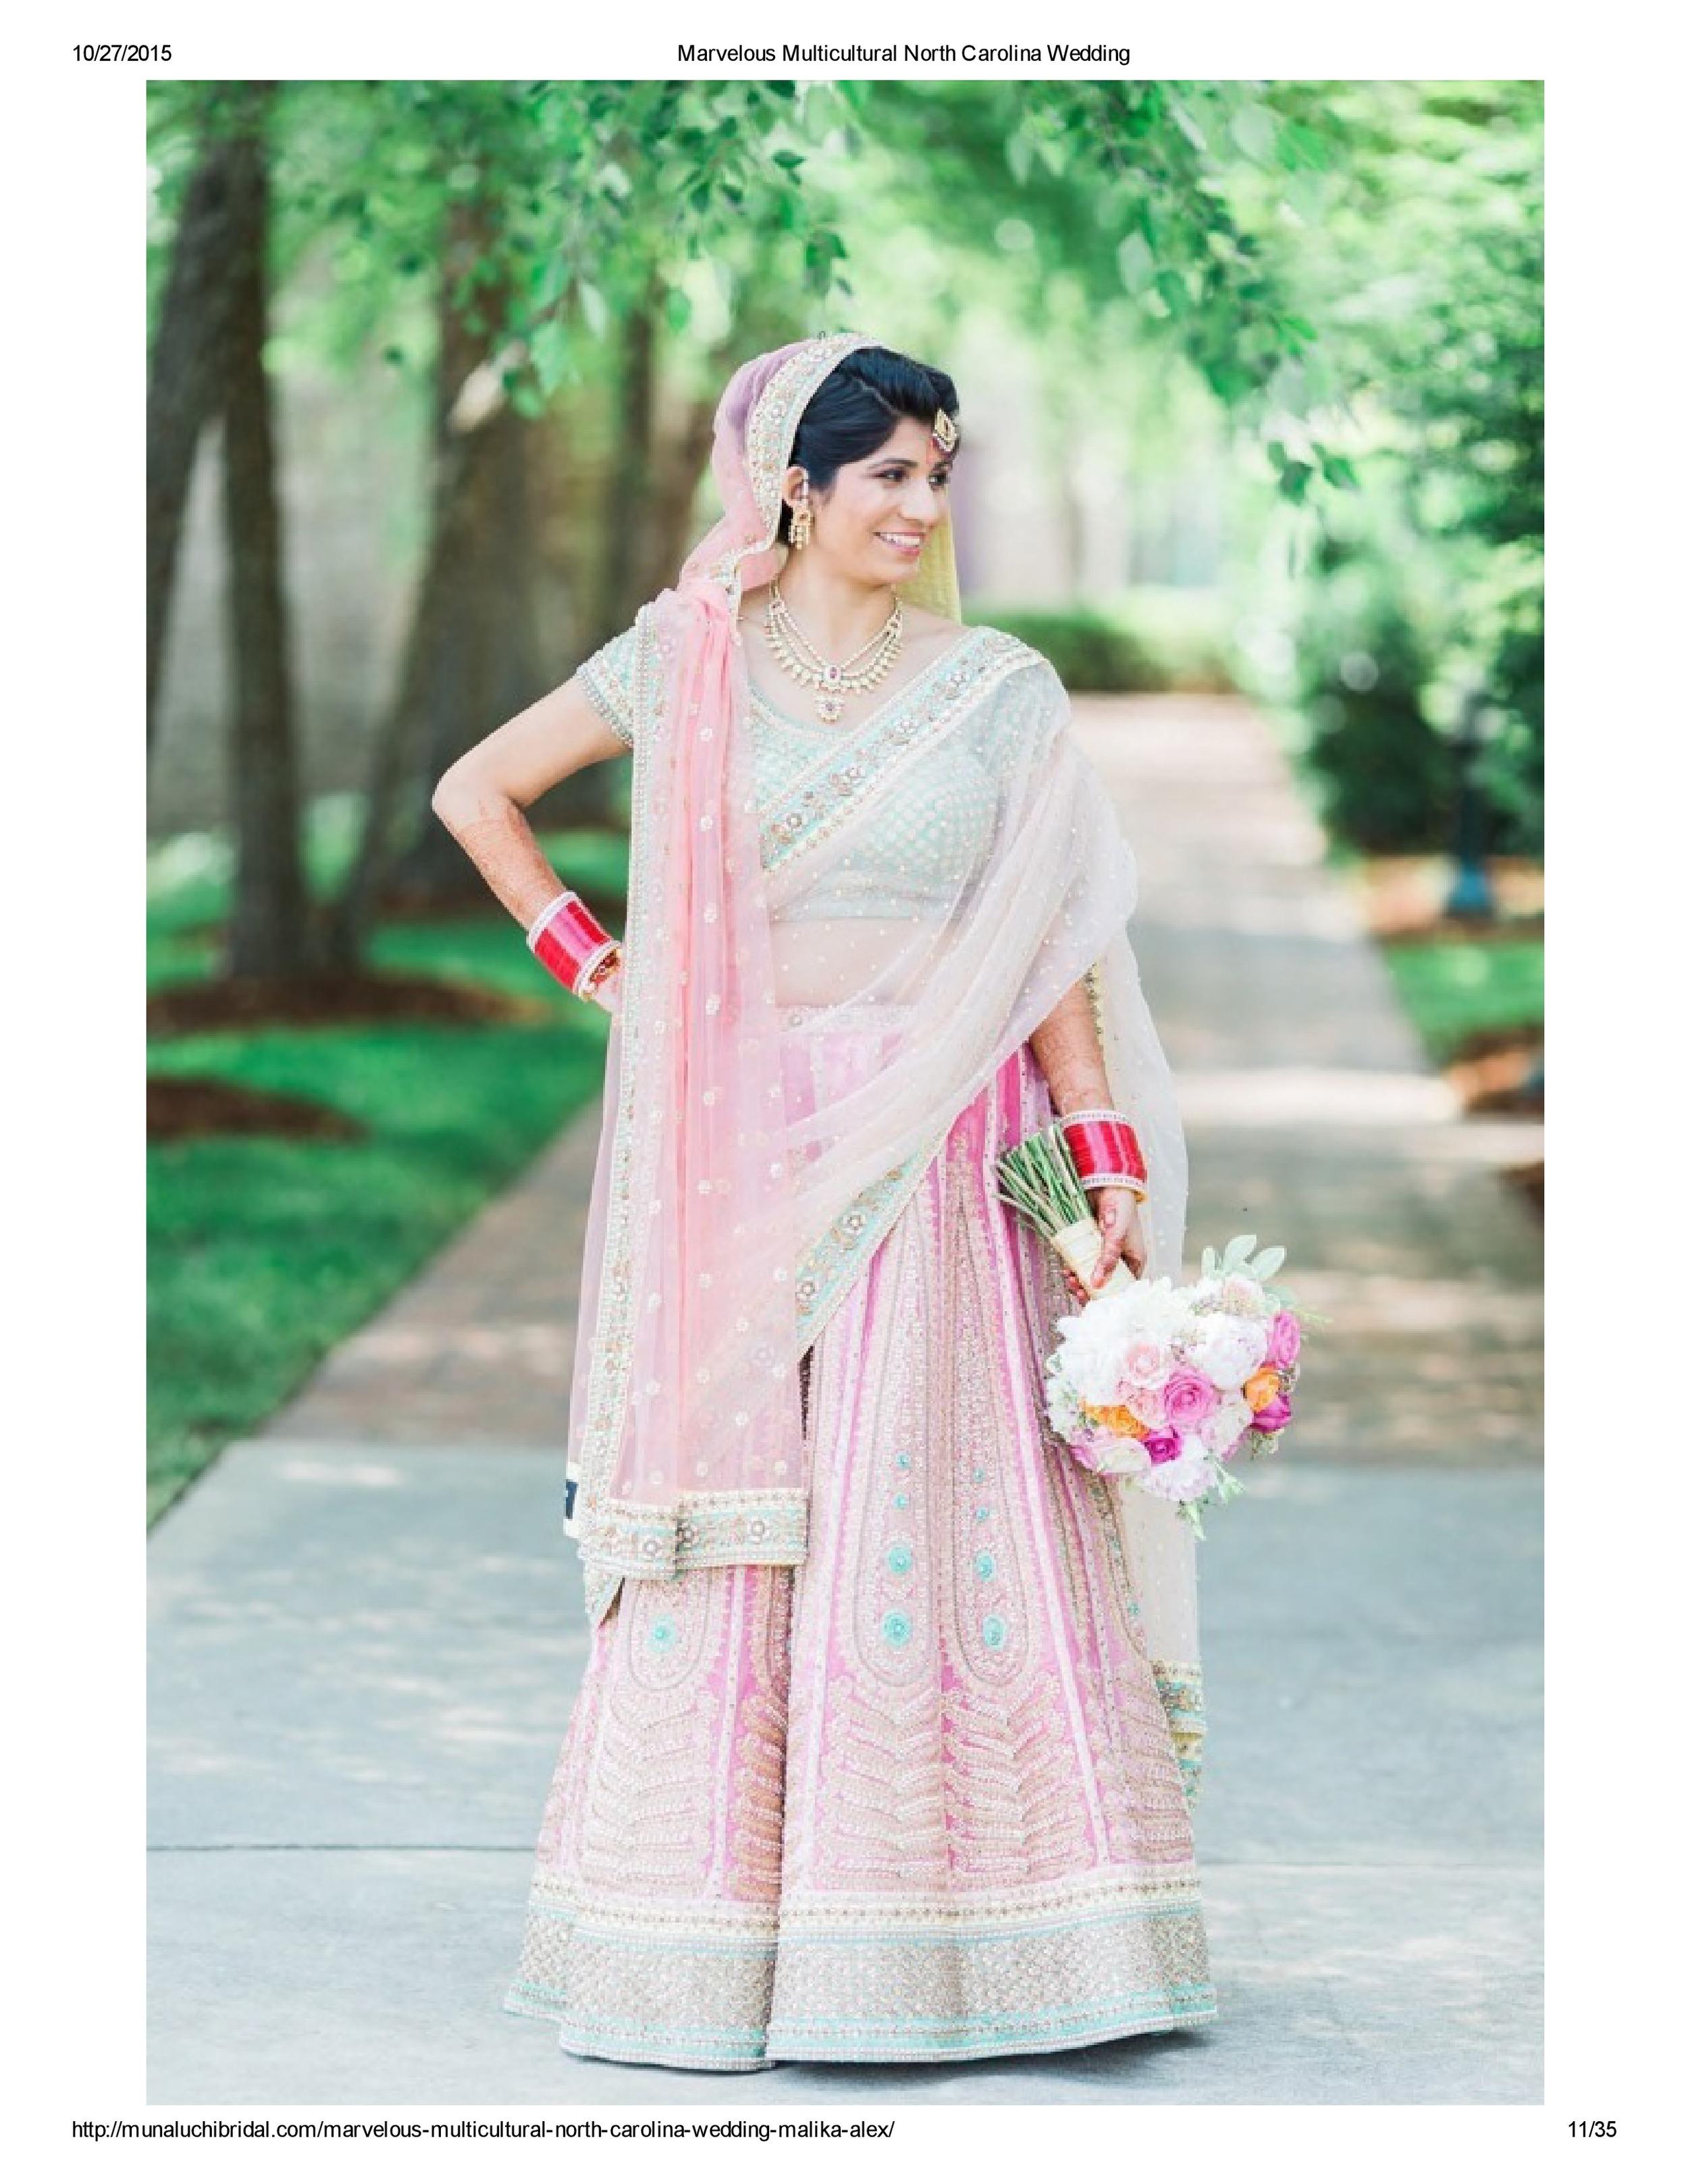 Marvelous Multicultural North Carolina Wedding - Alex & Malika-page-10.jpg